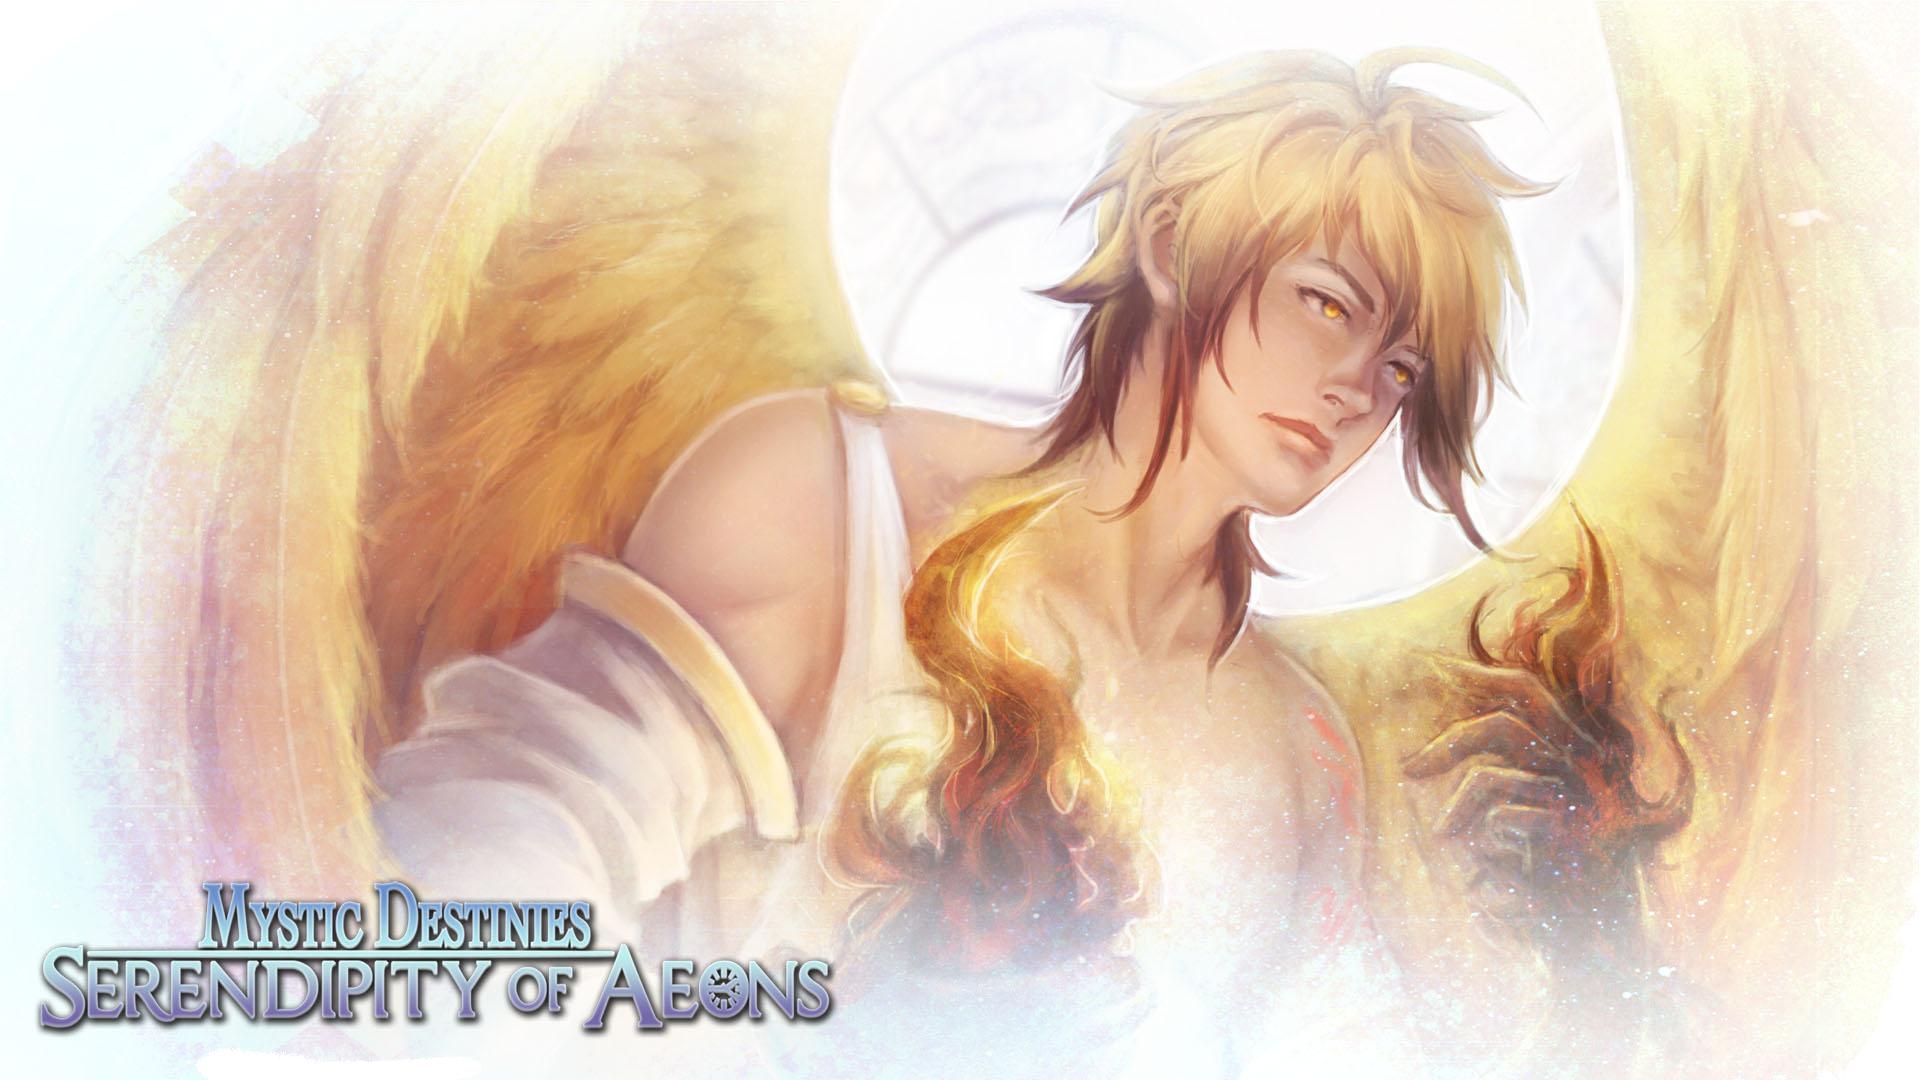 Mystic Destinies: Serendipity of Aeons: Shou